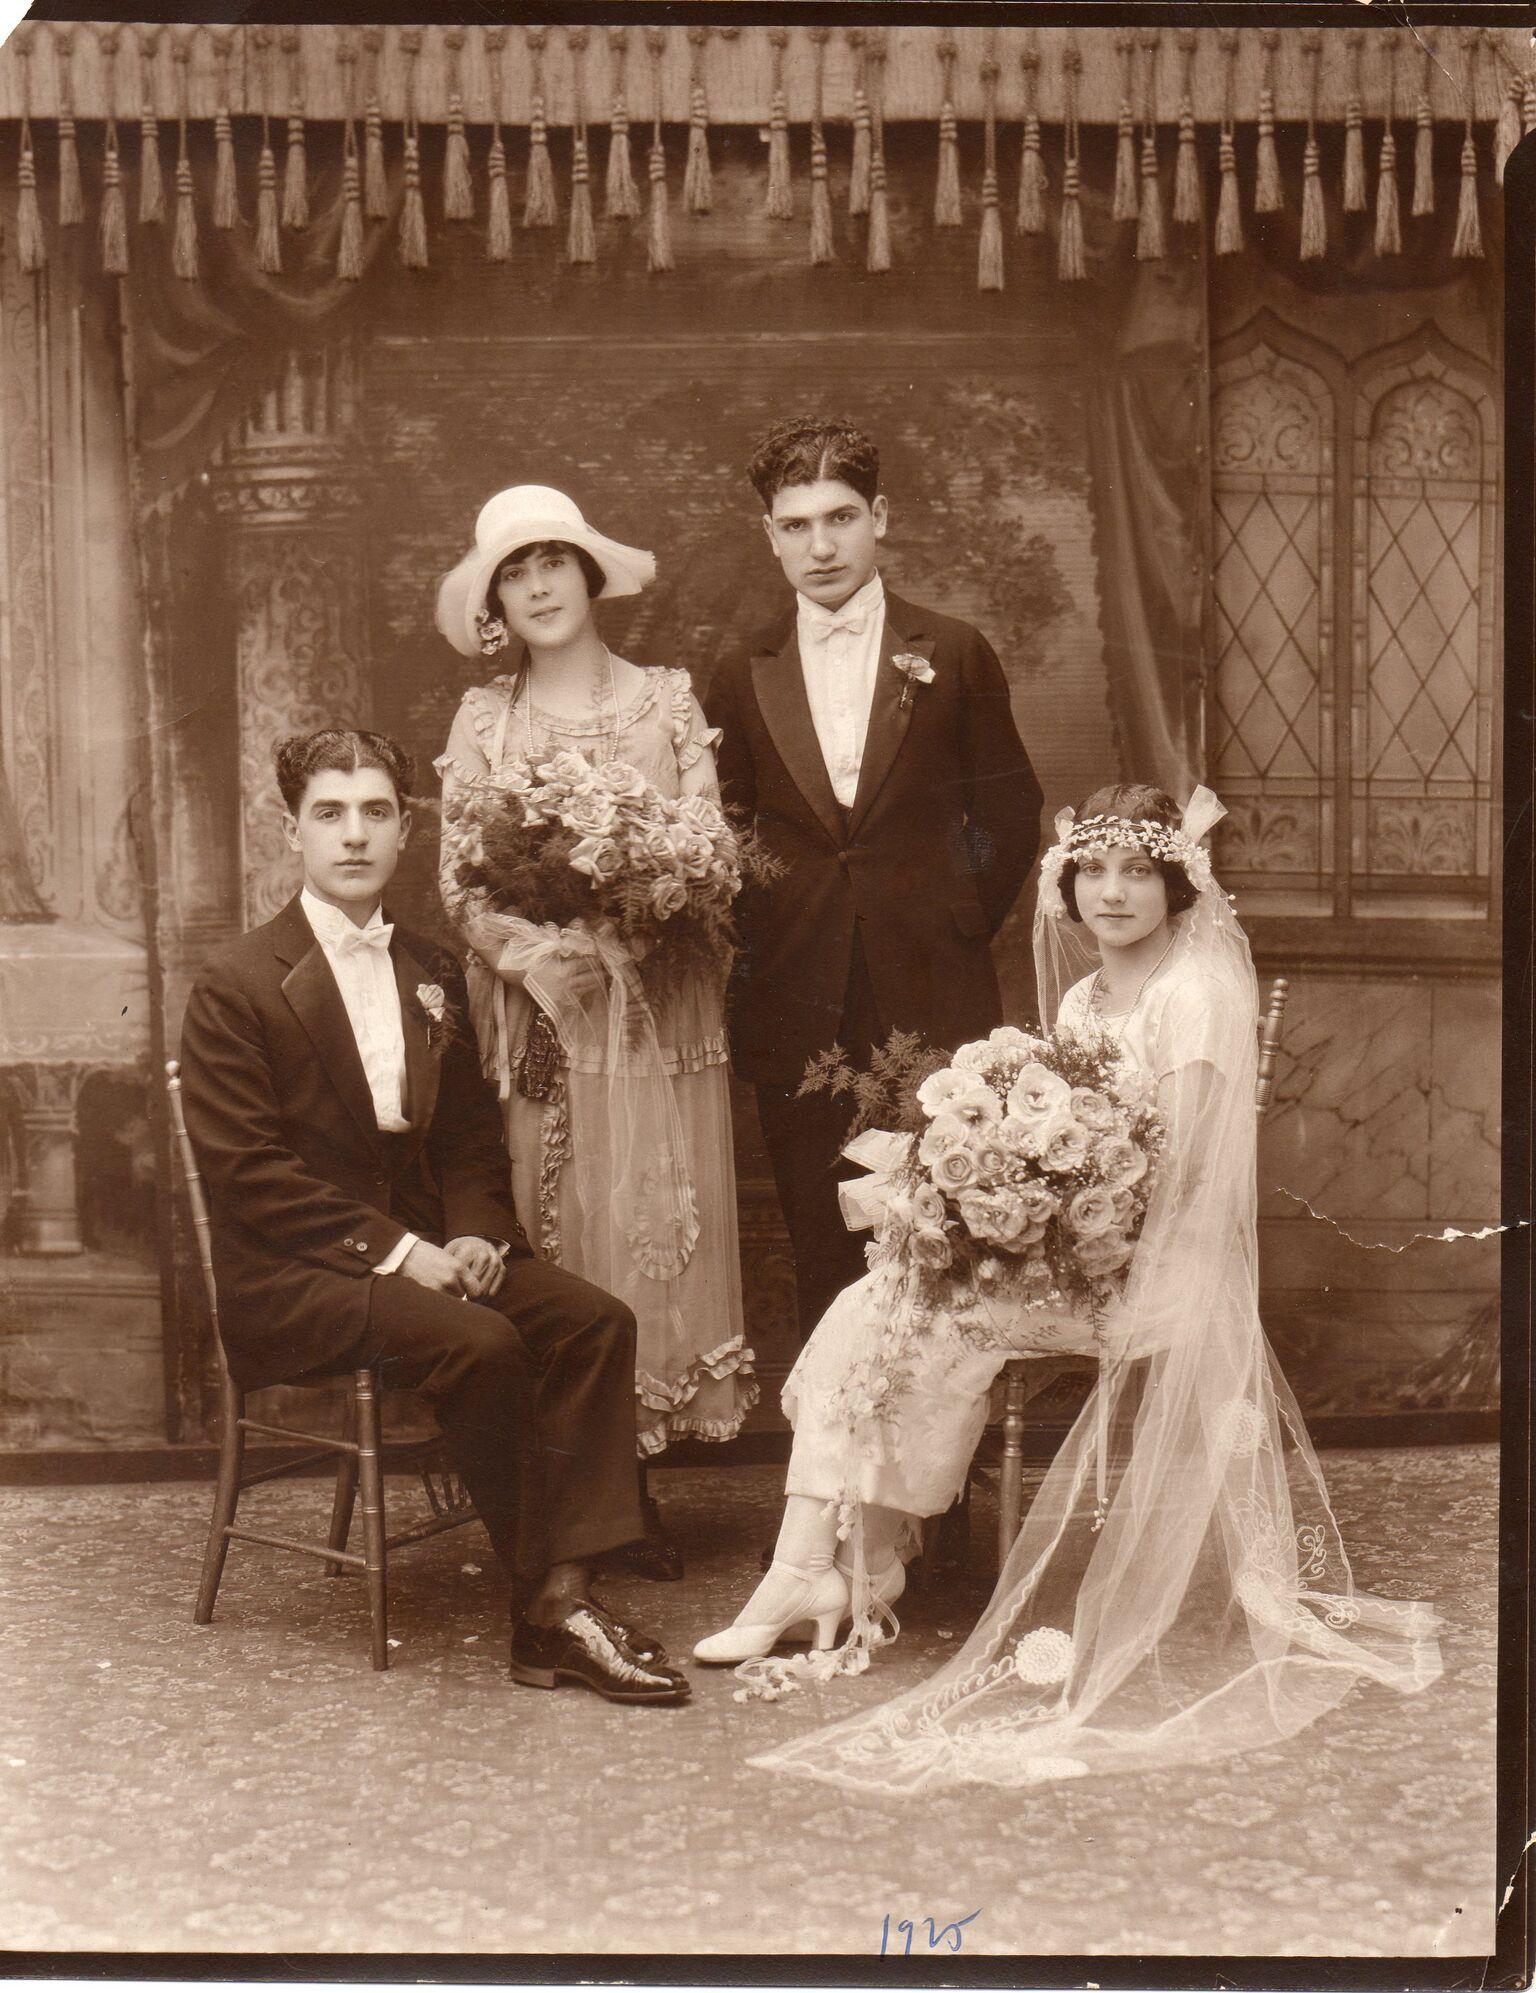 WeddingJune1925.jpg